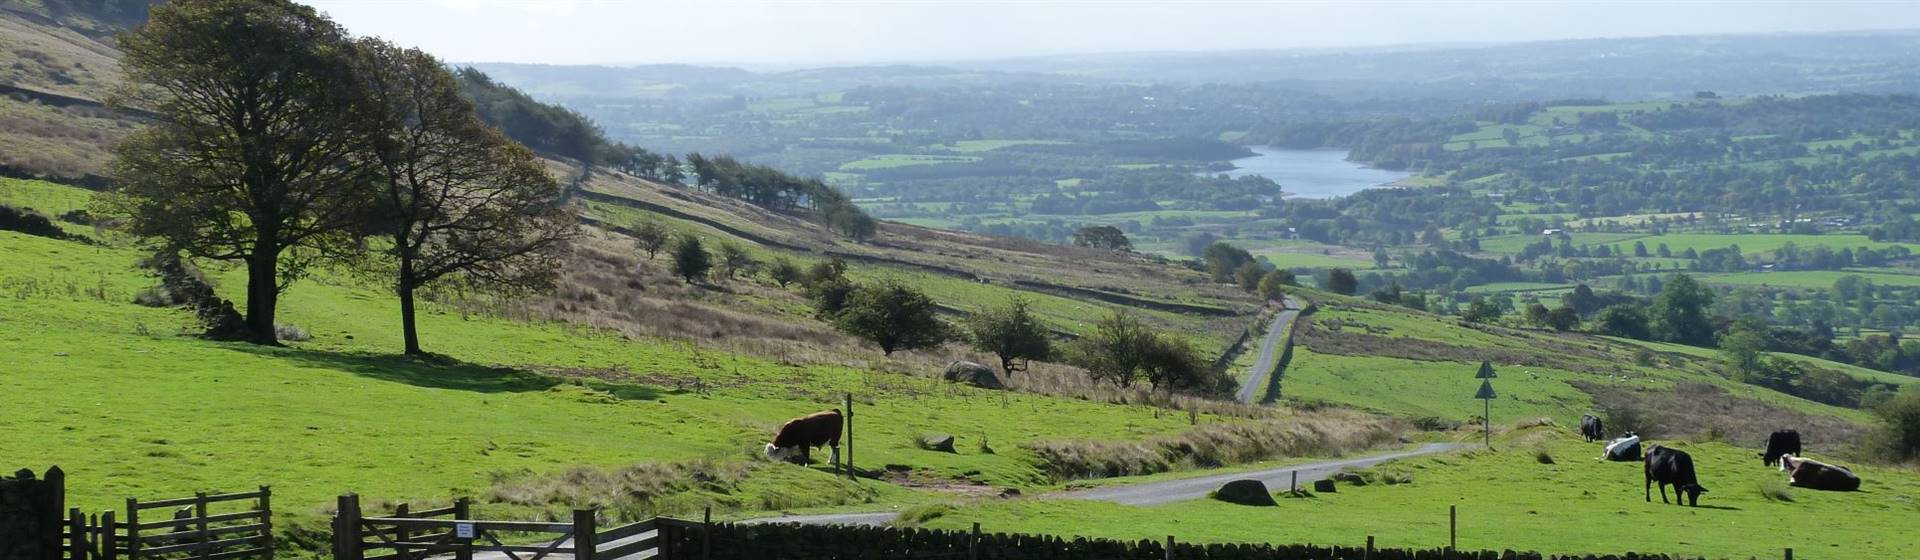 "<img src=""staffordshiremoorlands.jpeg"" alt=""Staffordshire Moorlands""/>"